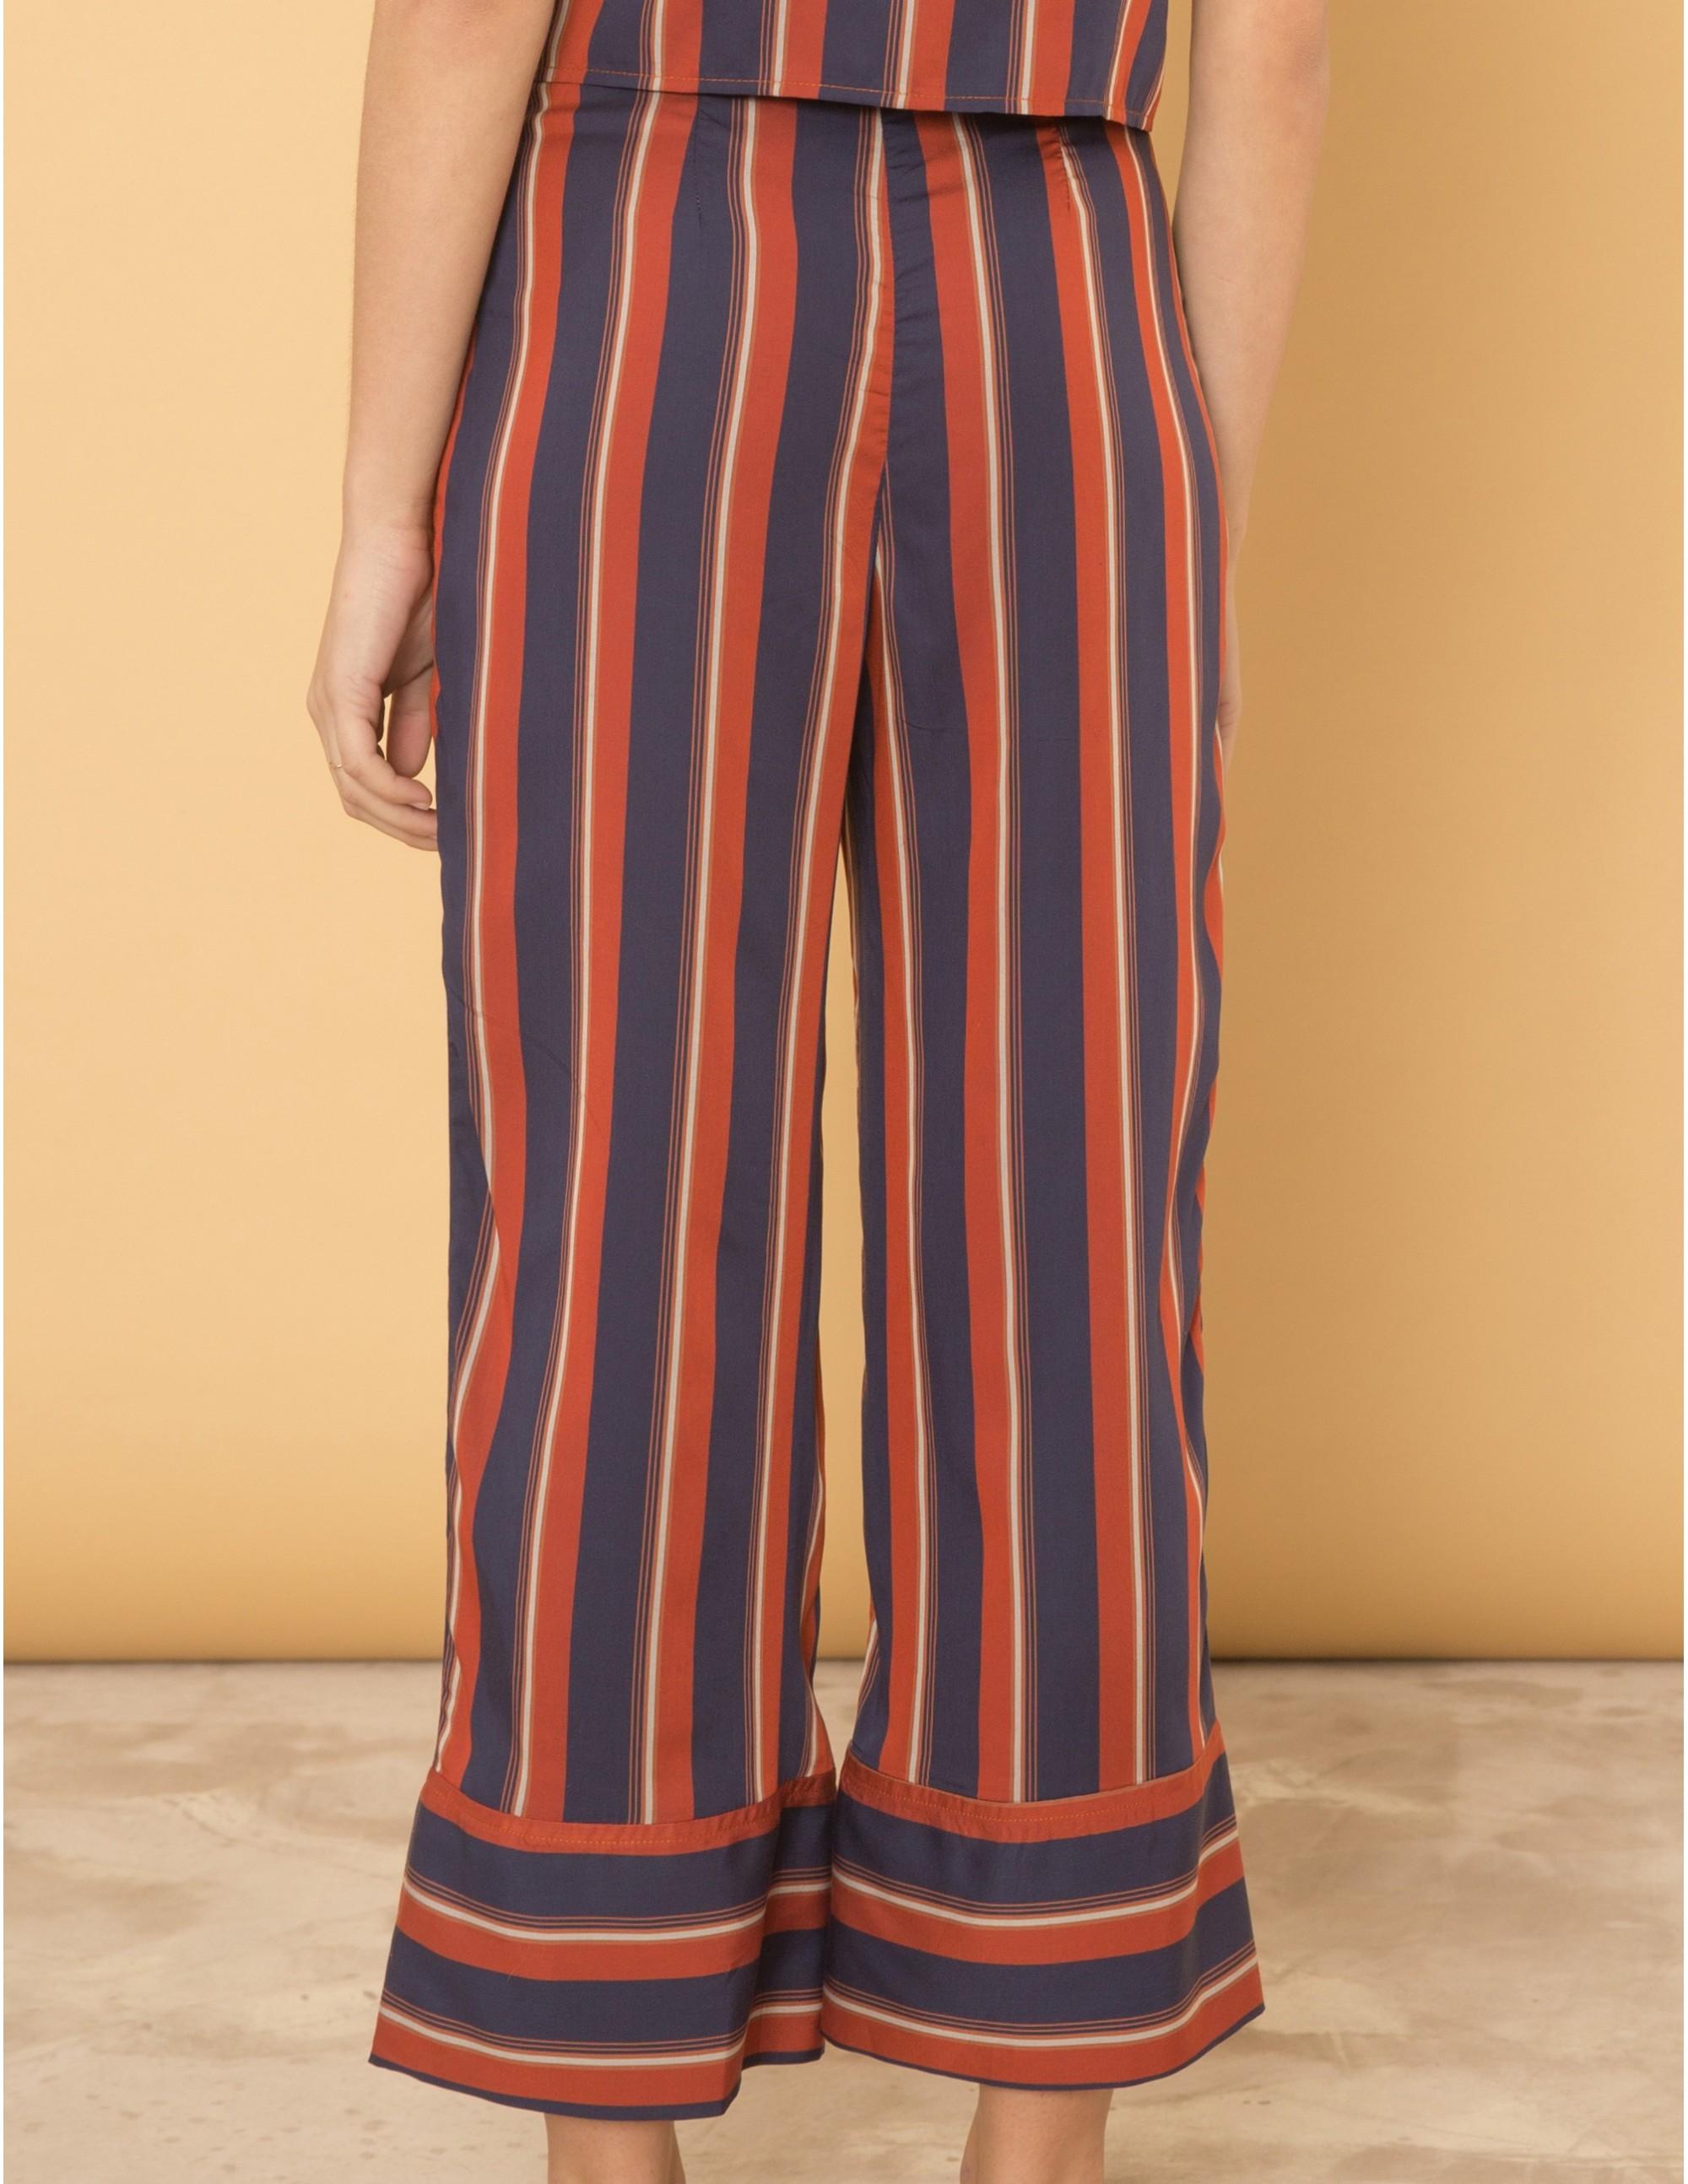 SATISFACTION pantalones - ROYAL AFFAIR